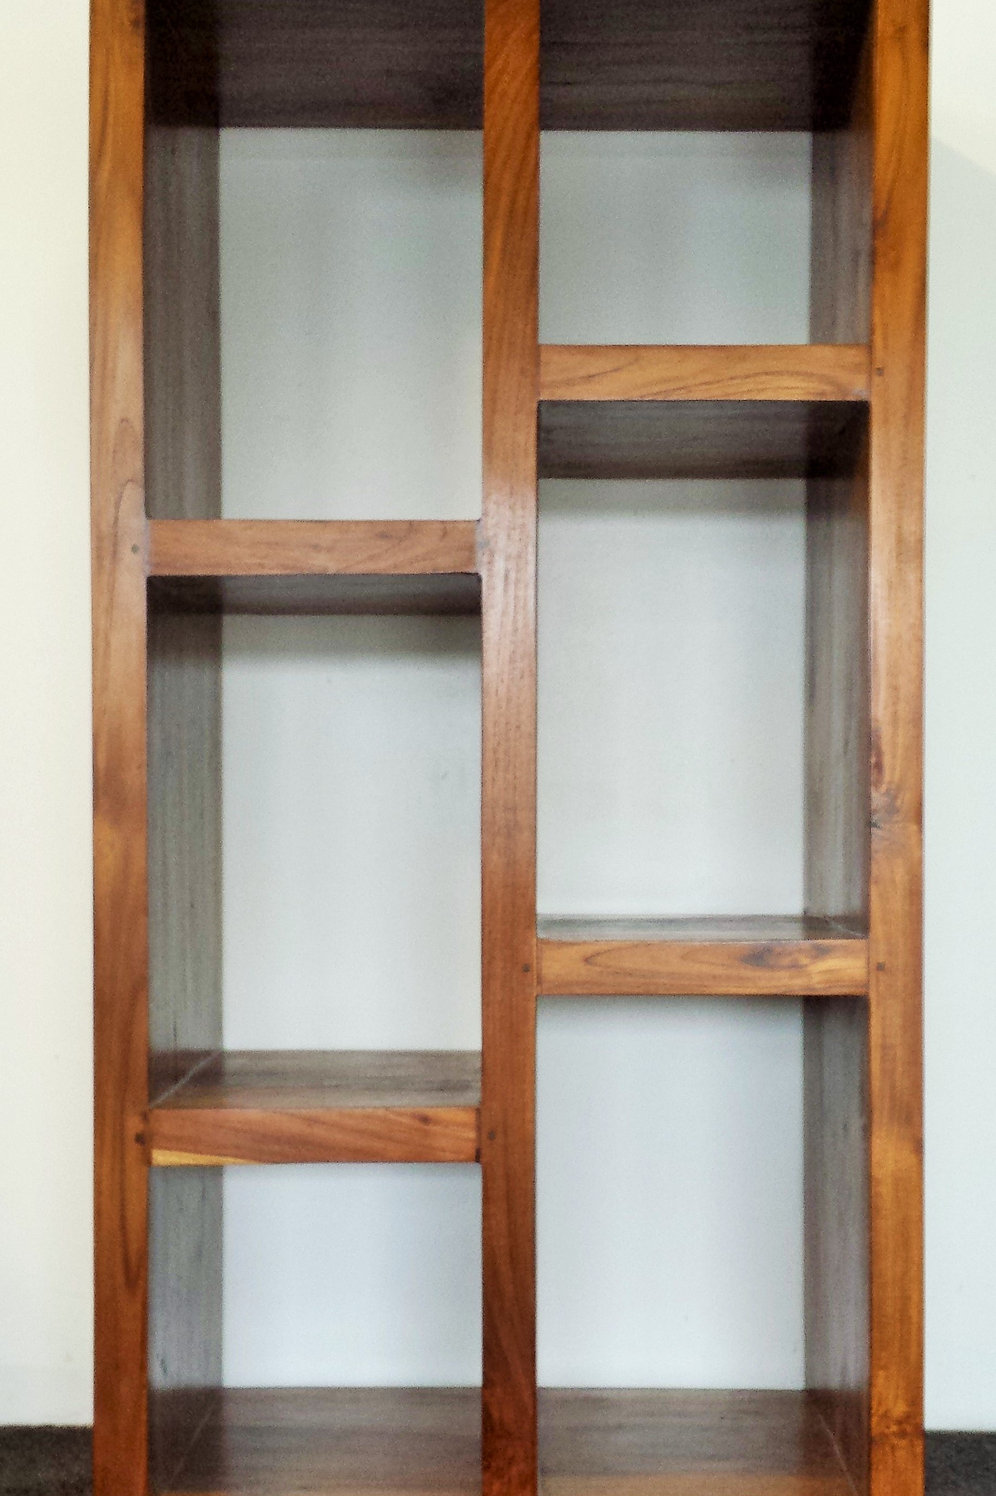 Retro offset Display unit or Book case